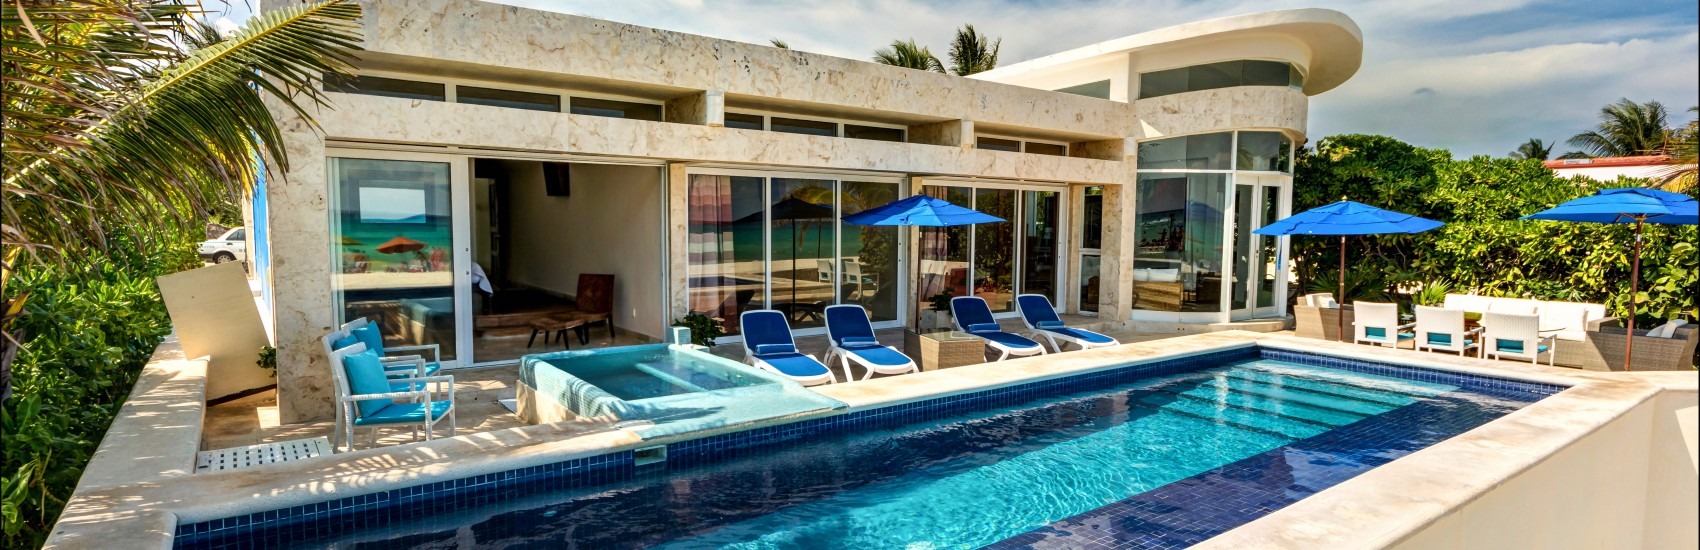 beach house - riviera maya | journey mexico luxury villas